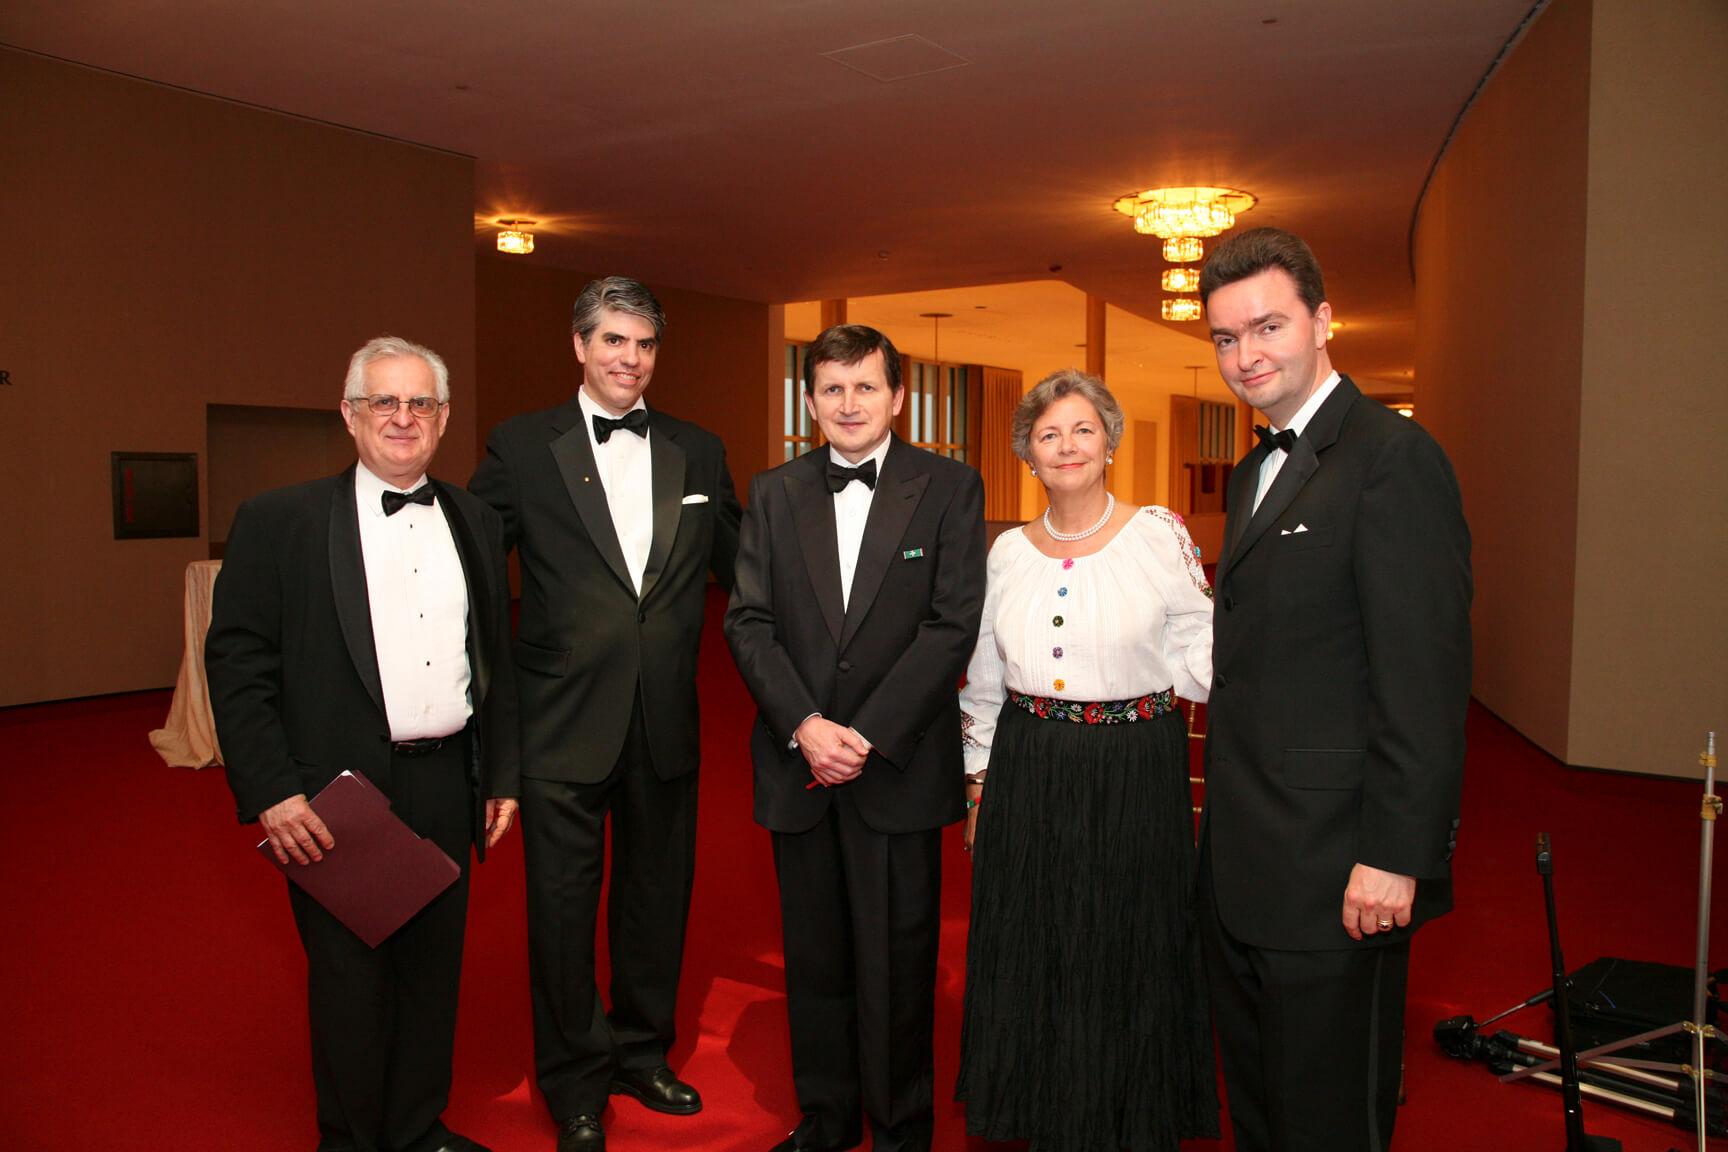 Mr. Zsolt Szekeres HAC Treasurer, Mr. Maximilian Teleki, Dr. Charles Simonyi, Mrs. Edith Lauer HAC Chair Emerita, and Ambassador Georg von Habsburg